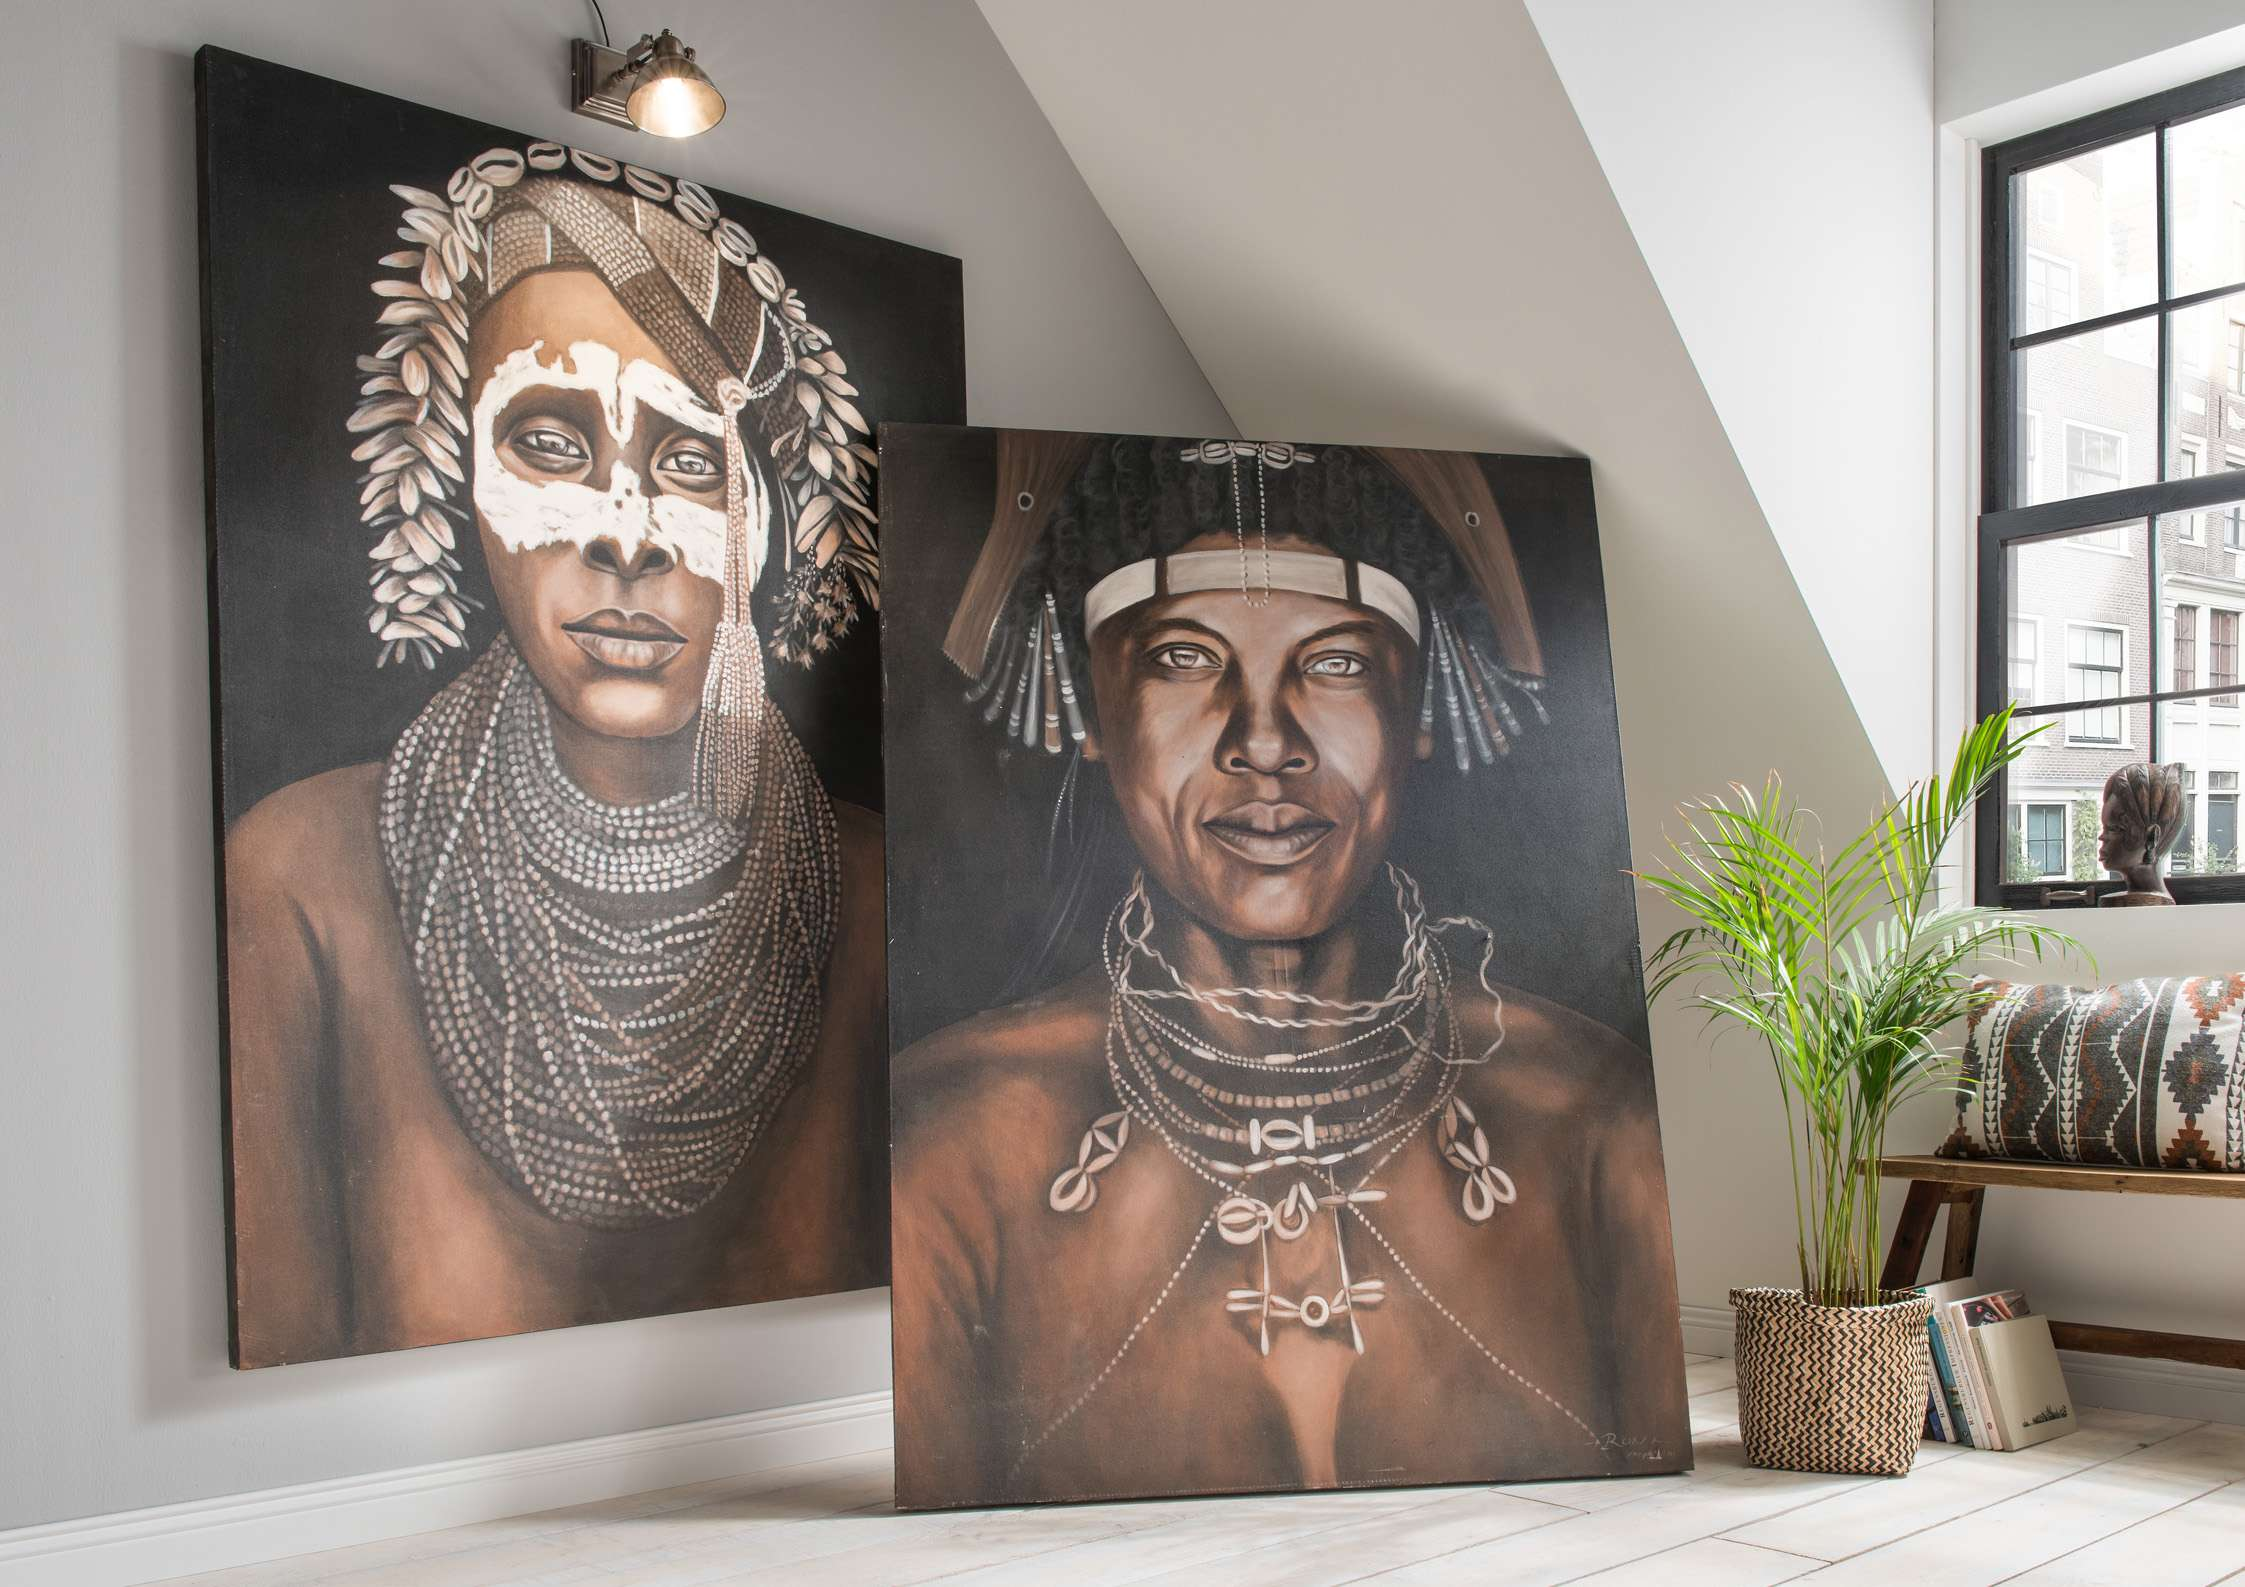 Wandbild INDIAN Man 1 rechts handgefertigt in Acrylfarben